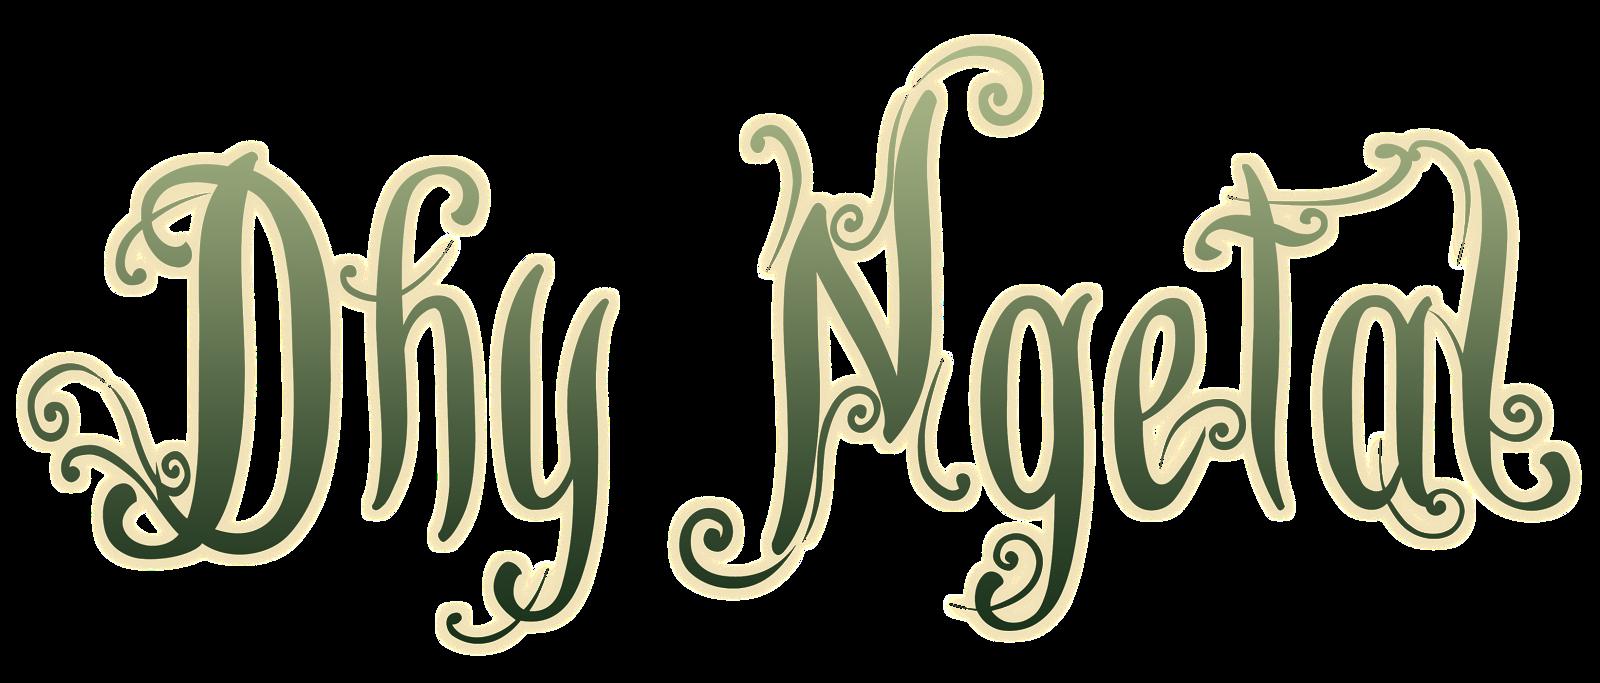 Dhy Ngetal - Fiando seus sonhos!